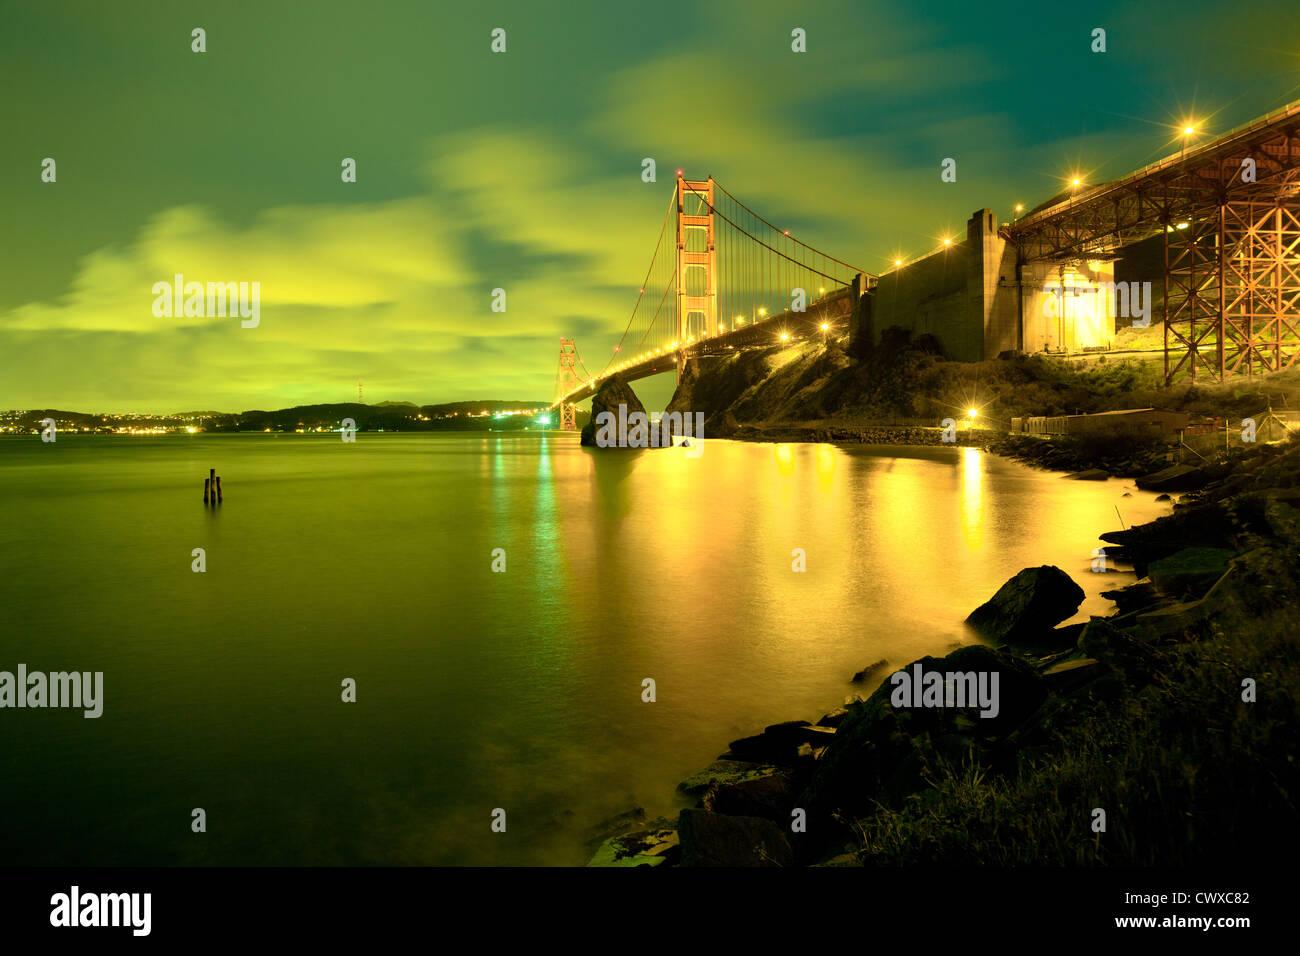 Die Golden Gate Bridge, San Francisco, Kalifornien, USA Stockbild